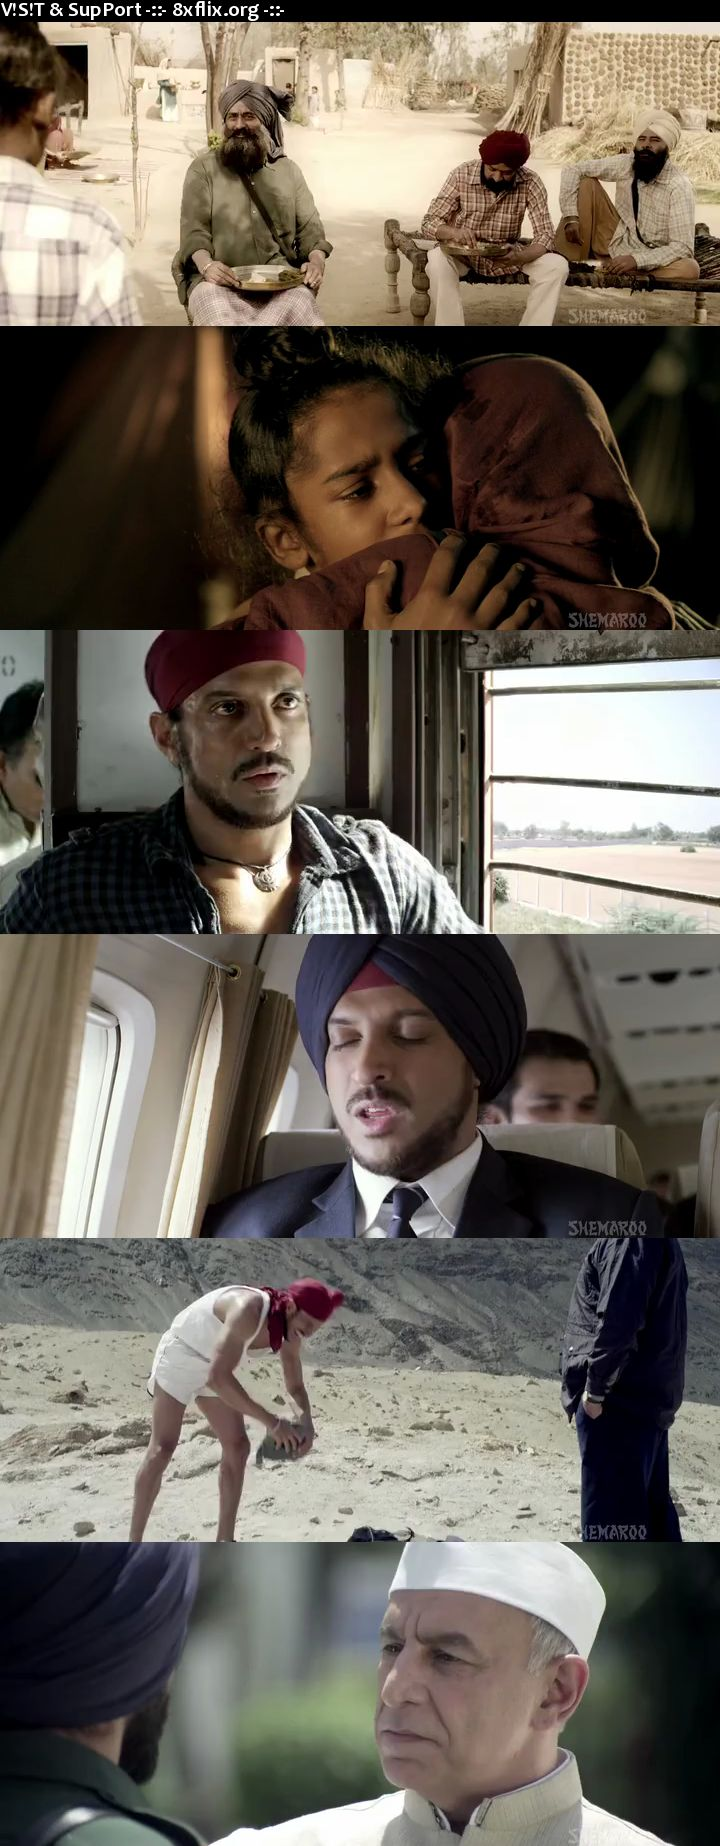 Bhaag Milkha Bhaag 2013 Hindi English Dual Audio 720p 480p BluRay